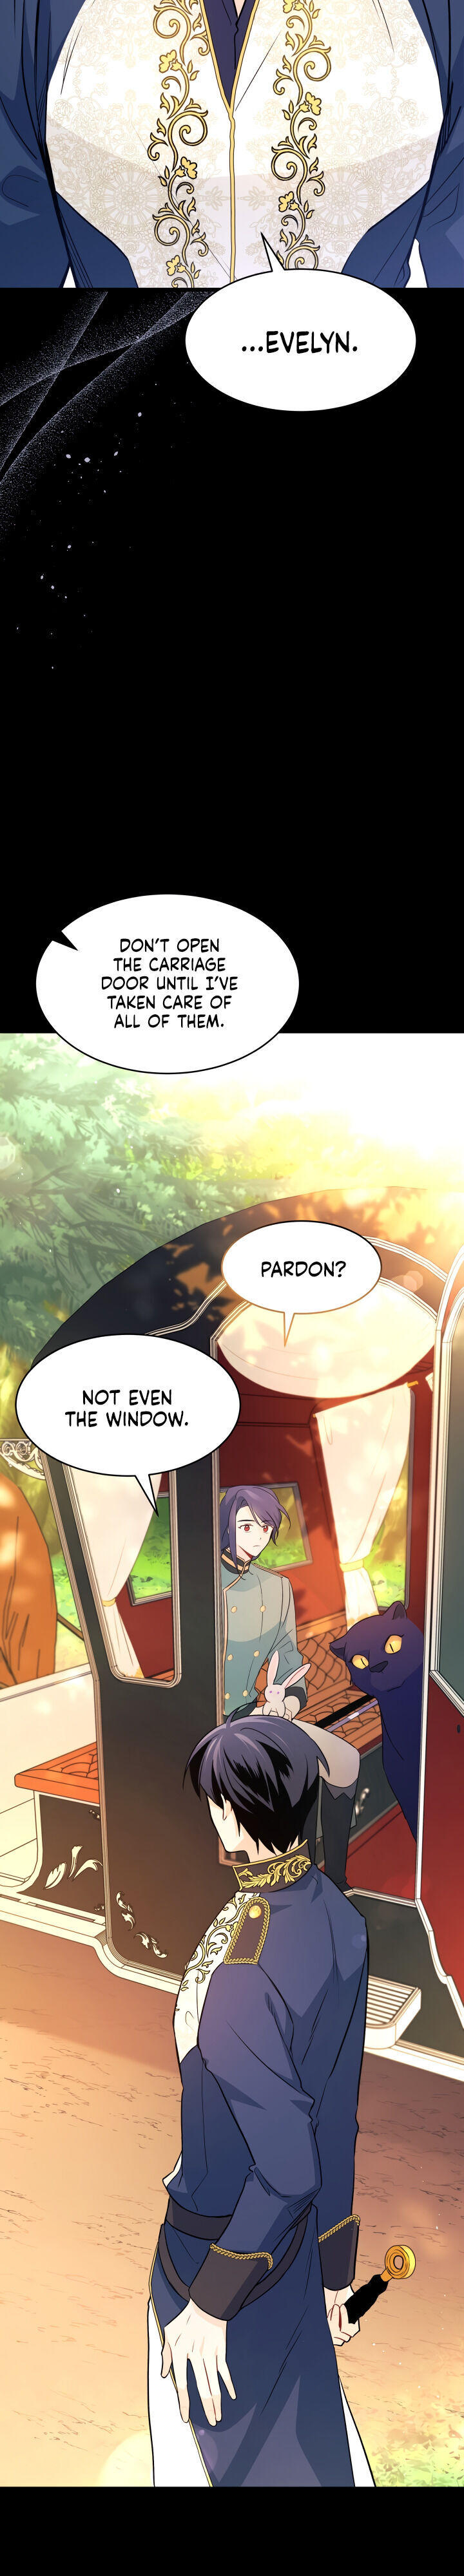 A Symbiotic Relationship Between A Rabbit And A Black Panther Chapter 27 page 10 - Mangakakalots.com